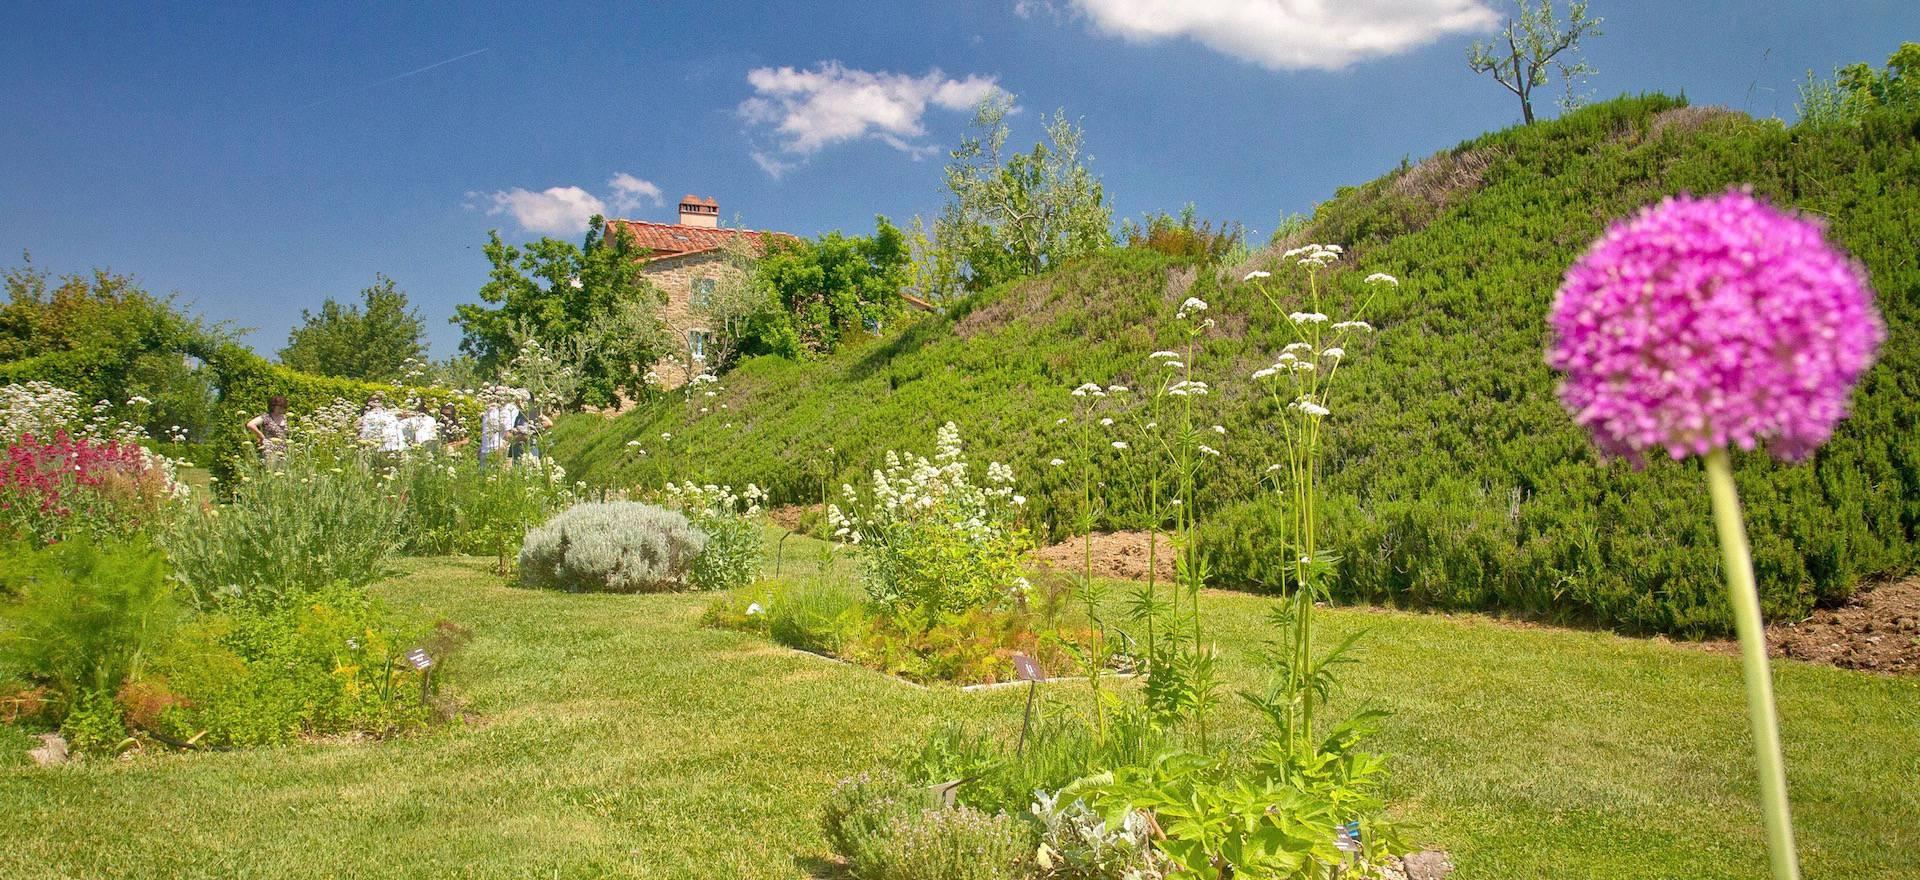 Agriturismo Toscane Agriturismo Toscane, luxe appartementen en mooi uitzicht